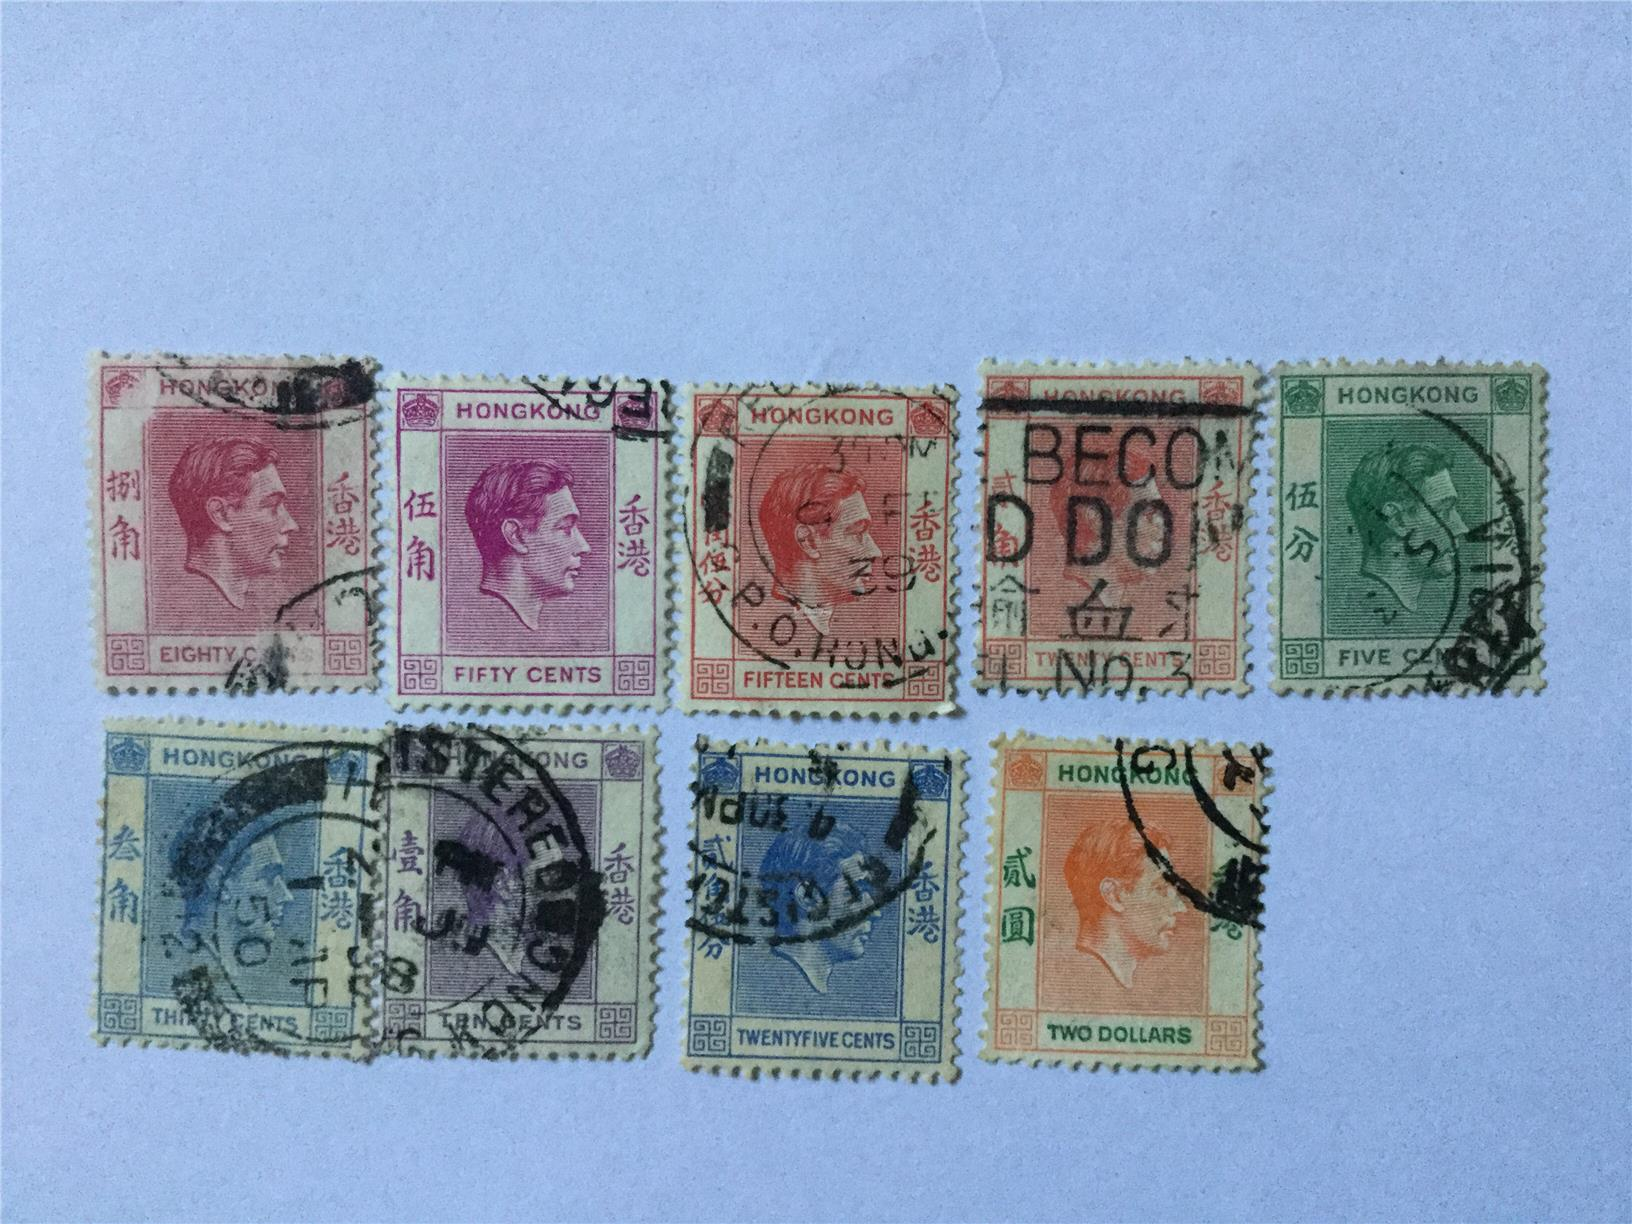 1949 Hong Kong Nice Stamps Lot 11